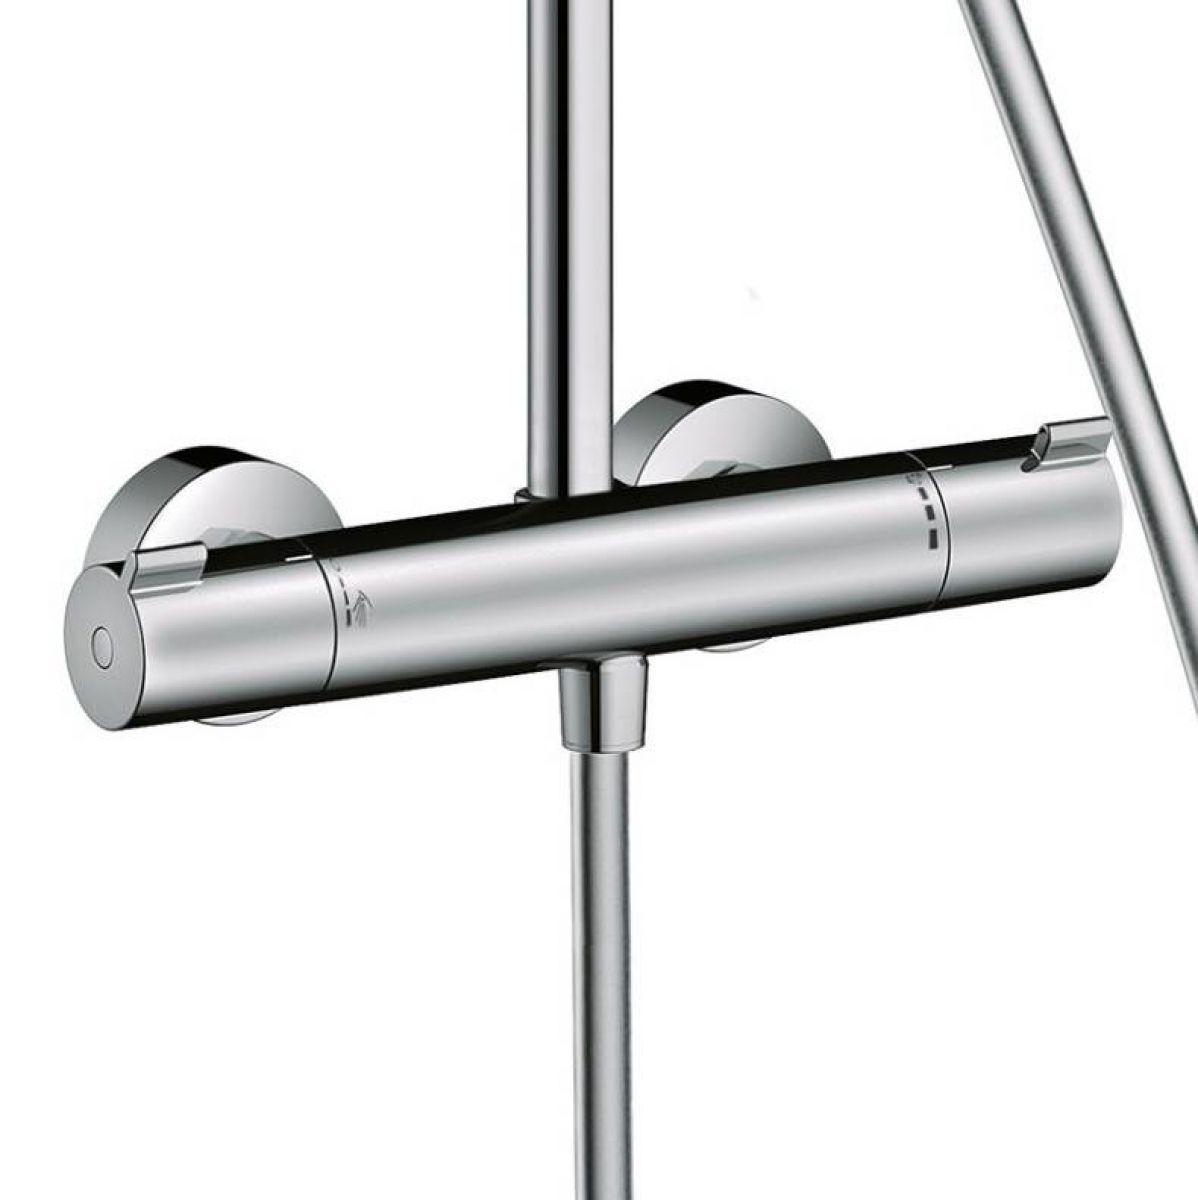 hansgrohe crometta s 240 1 jet showerpipe bathrooms. Black Bedroom Furniture Sets. Home Design Ideas